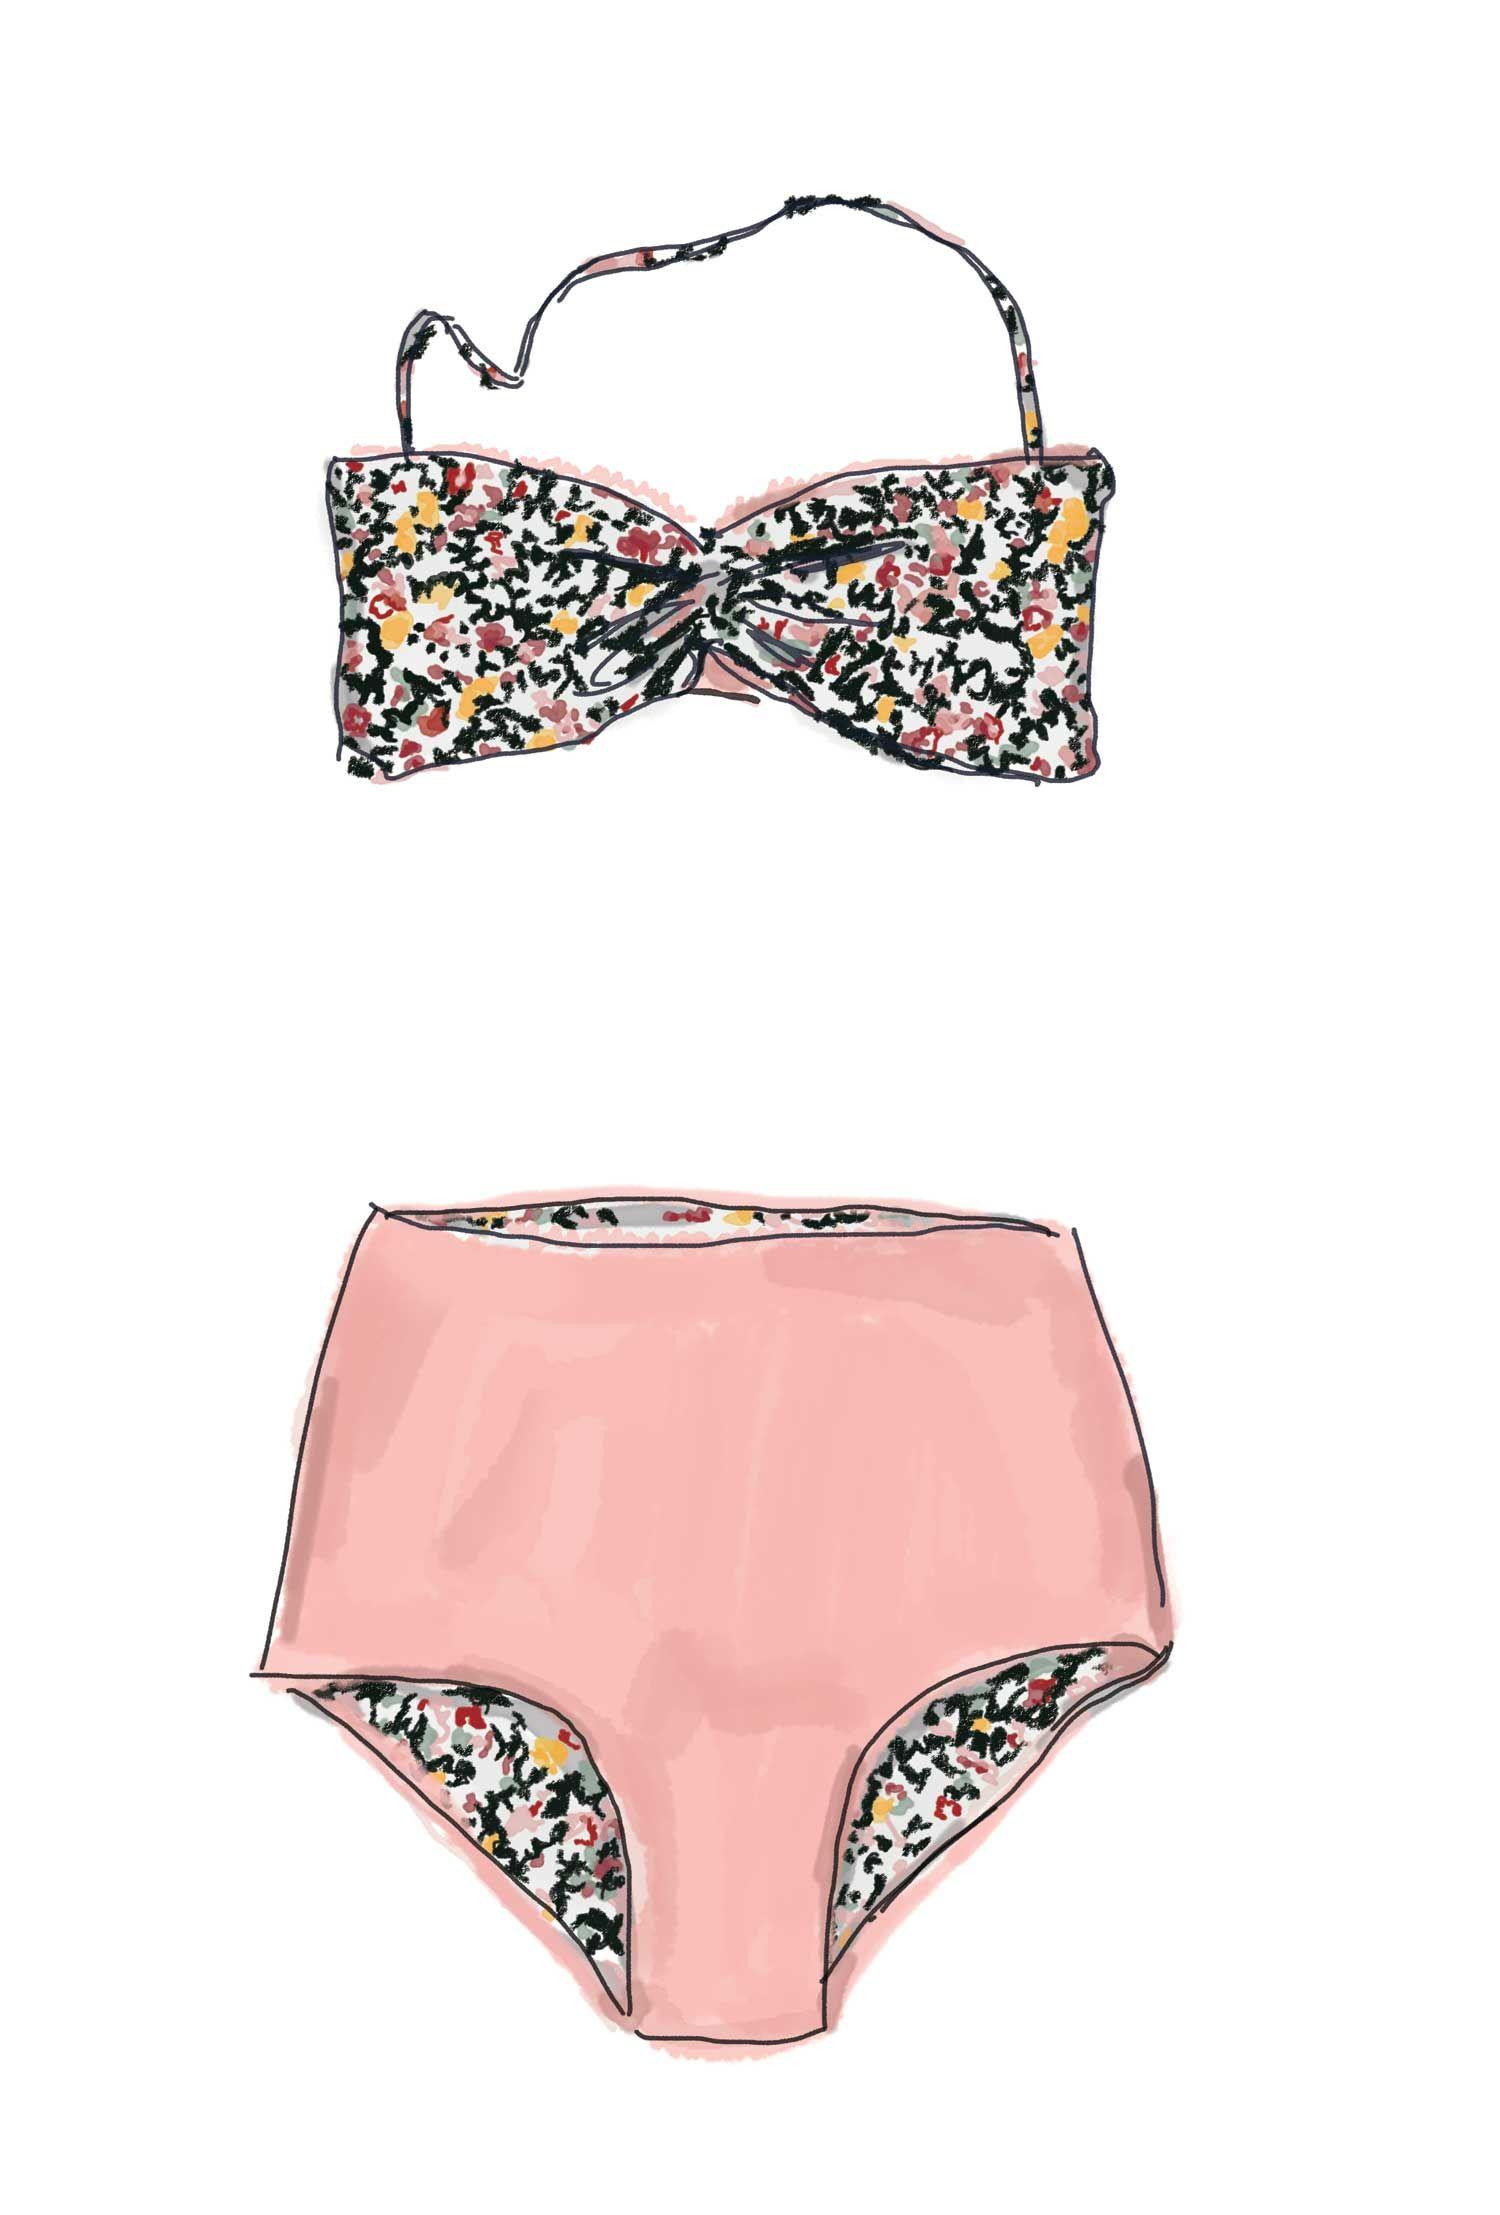 svg black and white Pin on i like. Bikini drawing bathing suit